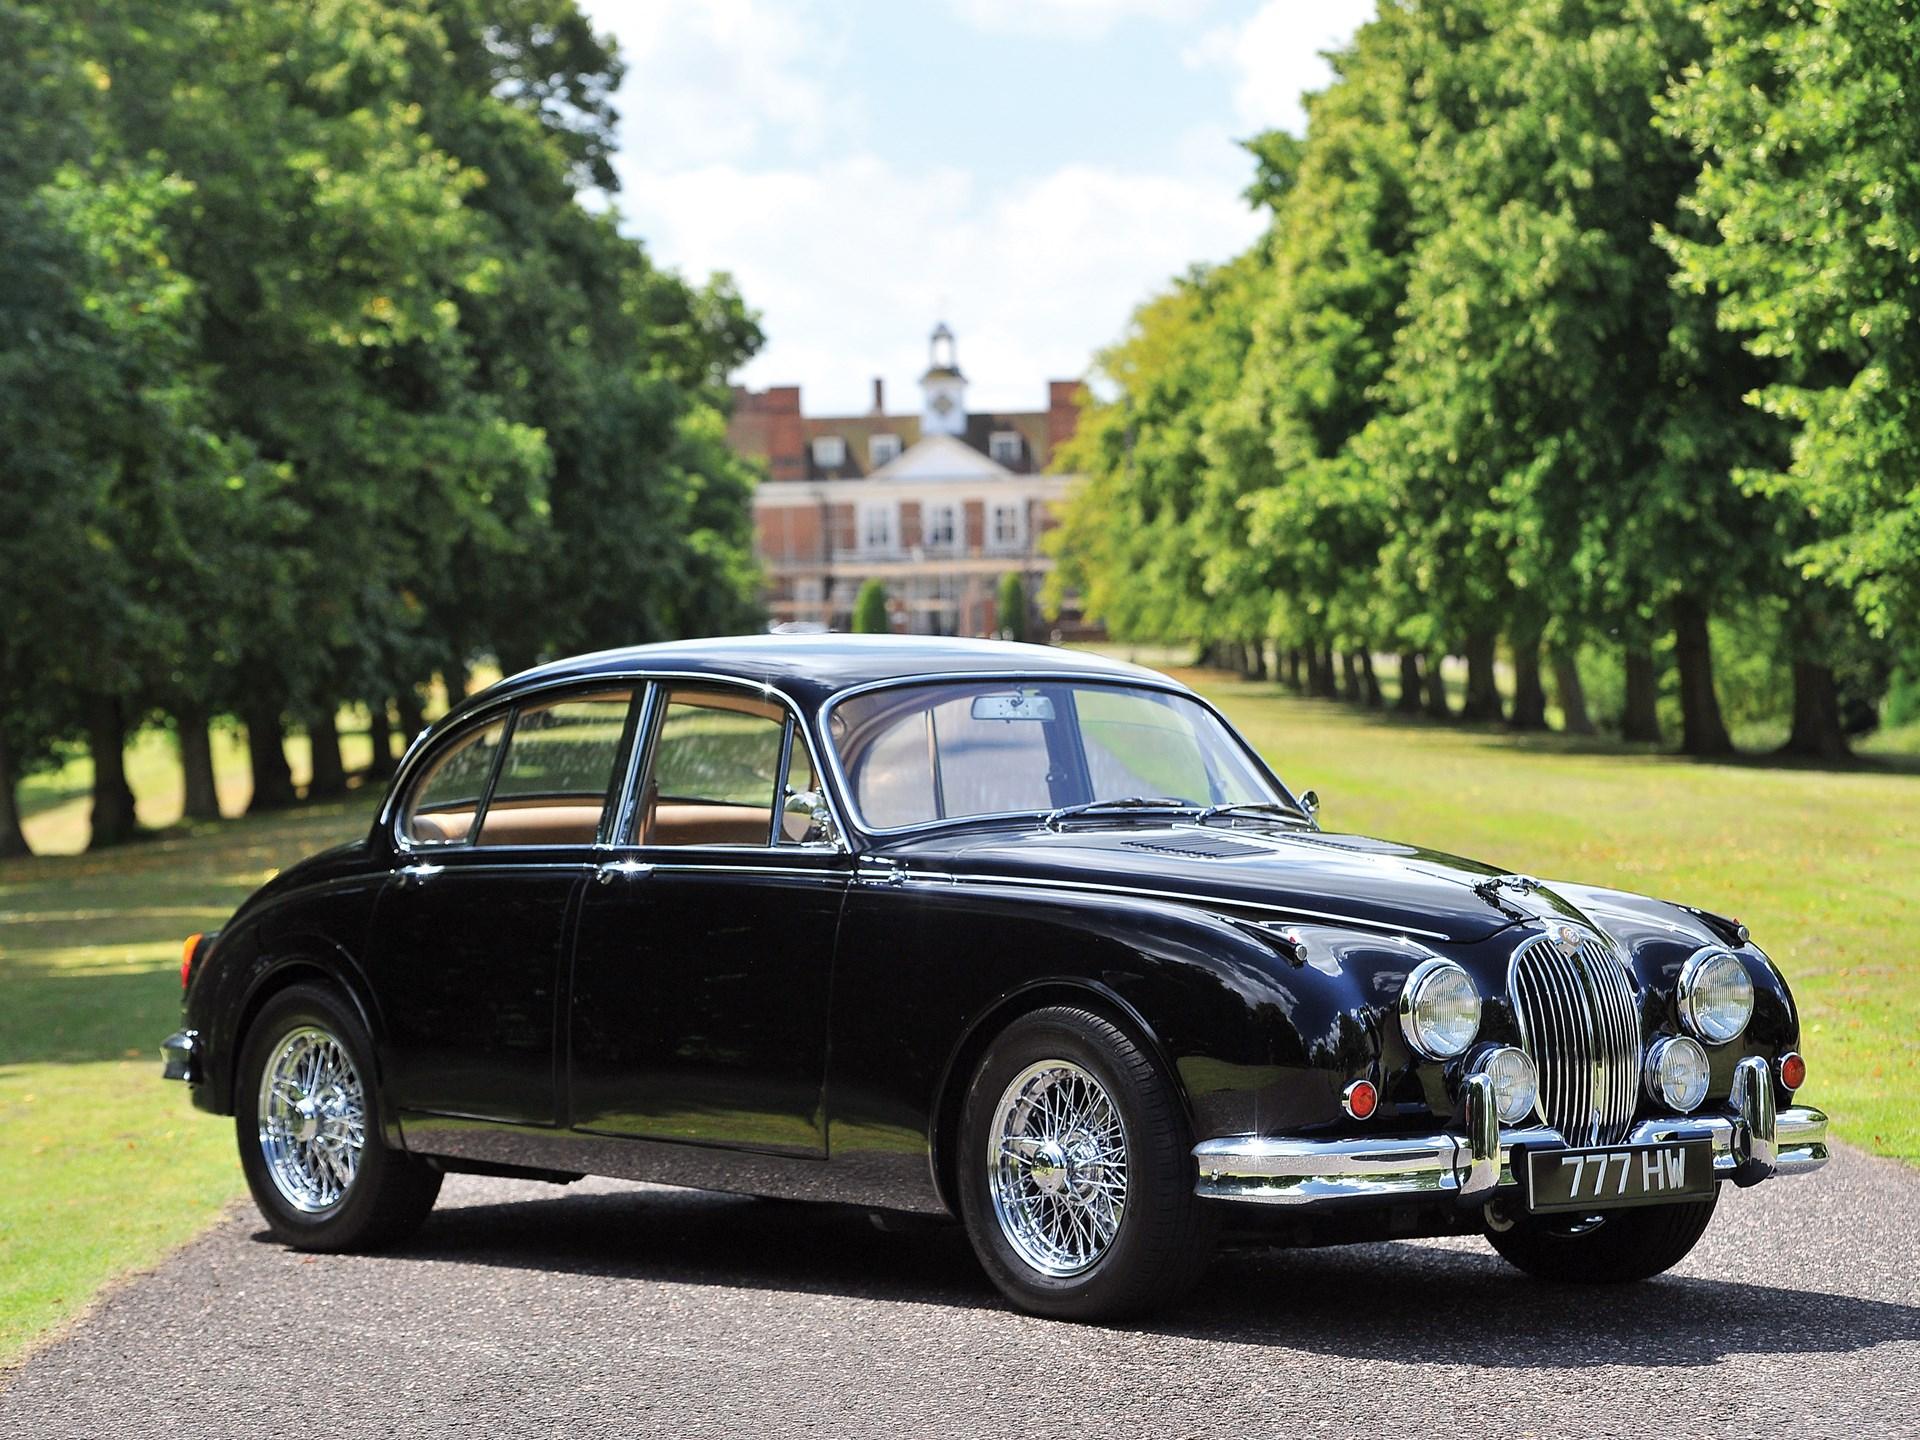 1961 Jaguar Mark 2 4.2 Saloon | London 2014 | RM Sotheby's